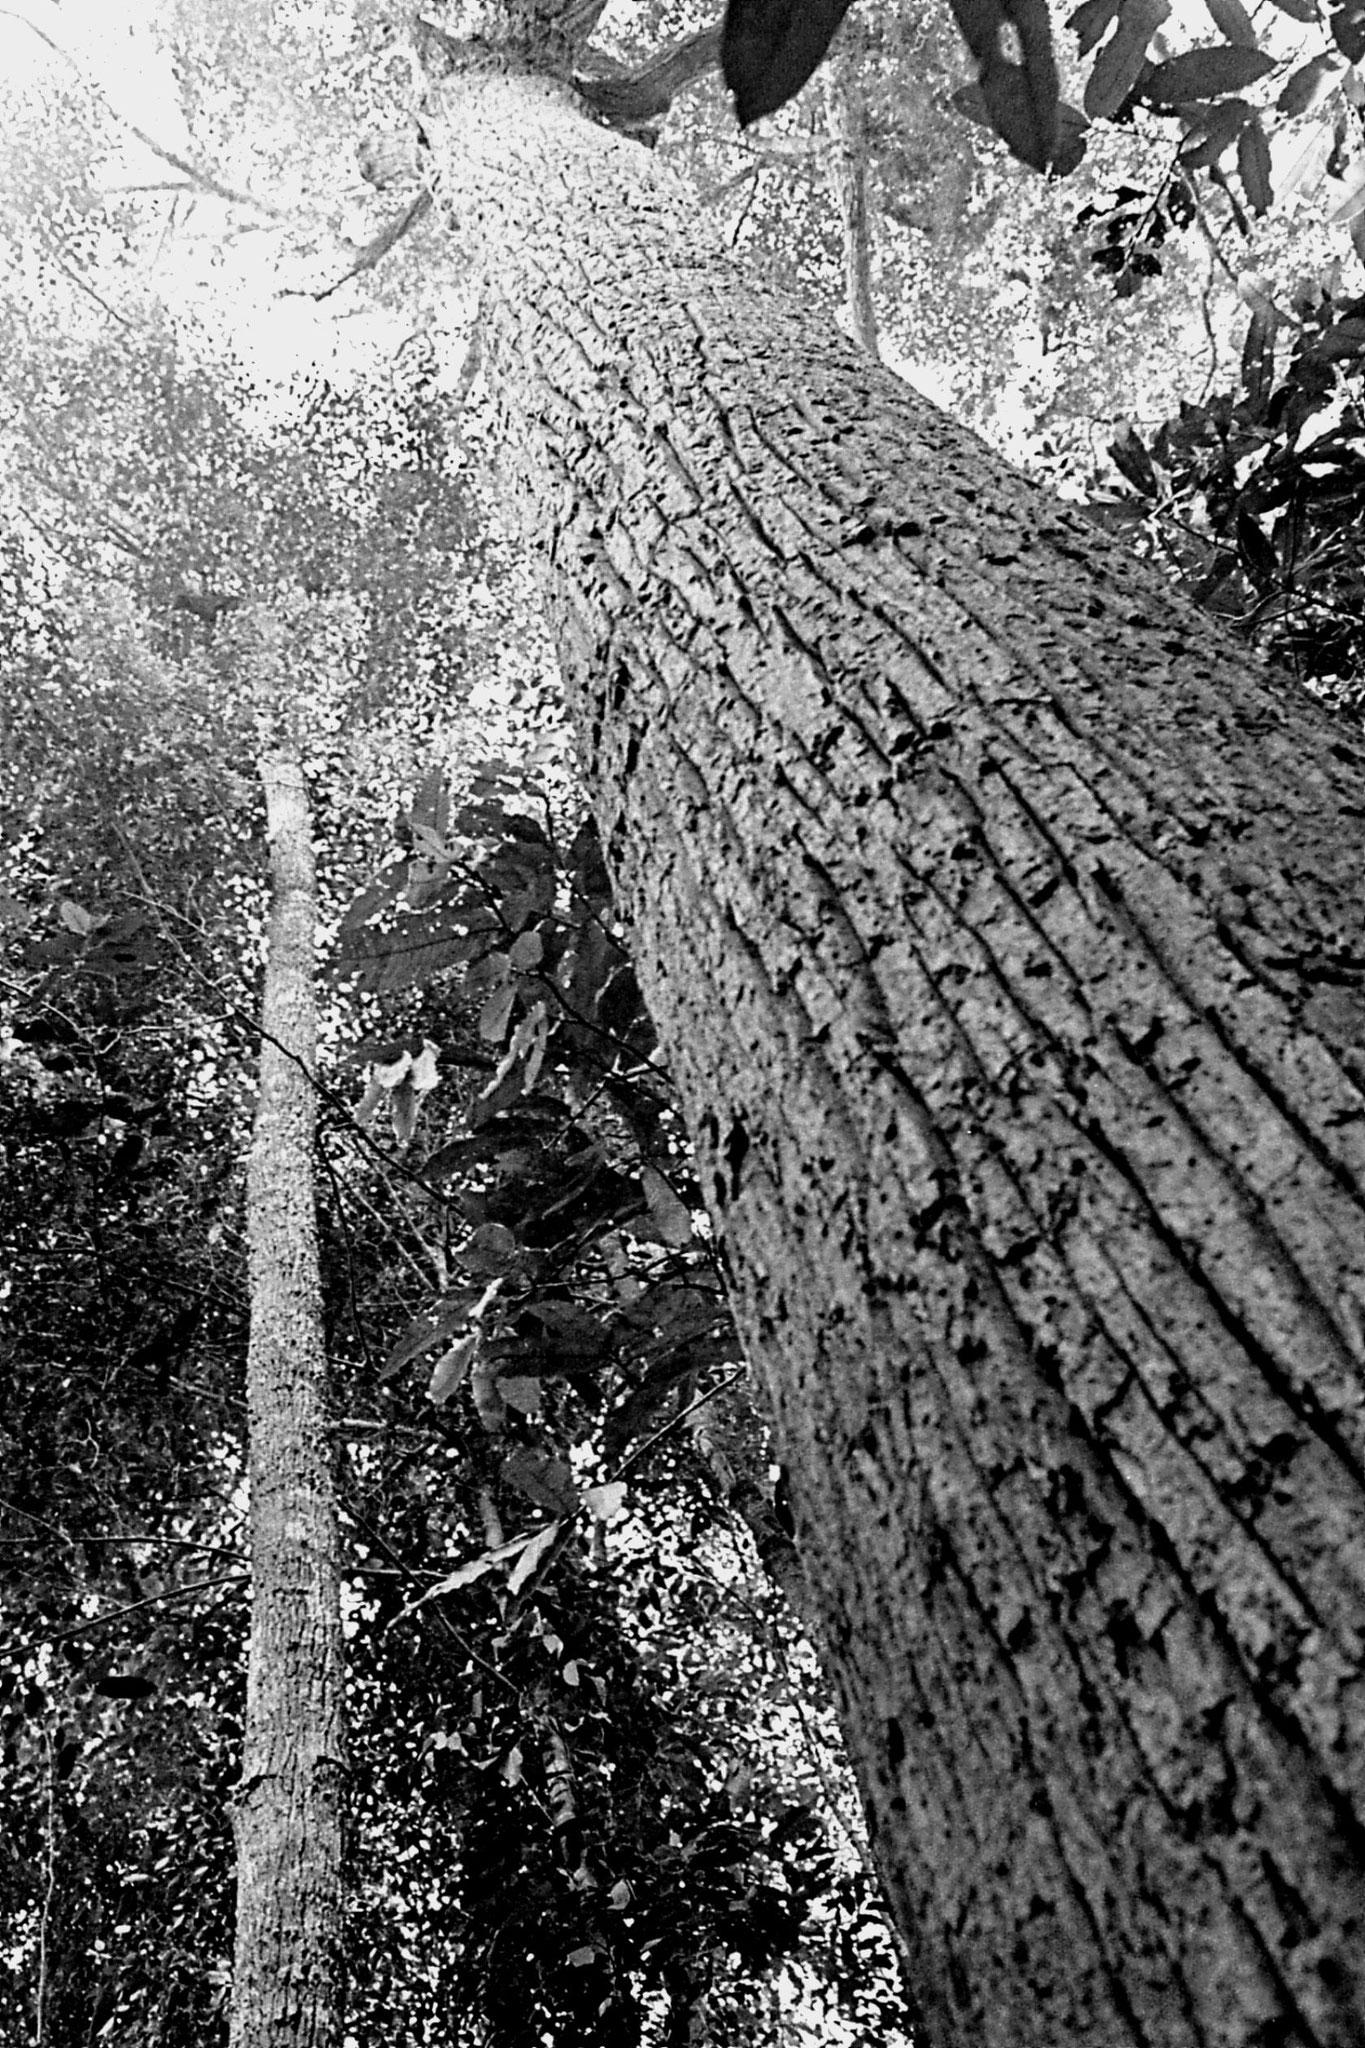 23/6/1990: 36: Tamen Negara, a Shorea Cortissi Seraya